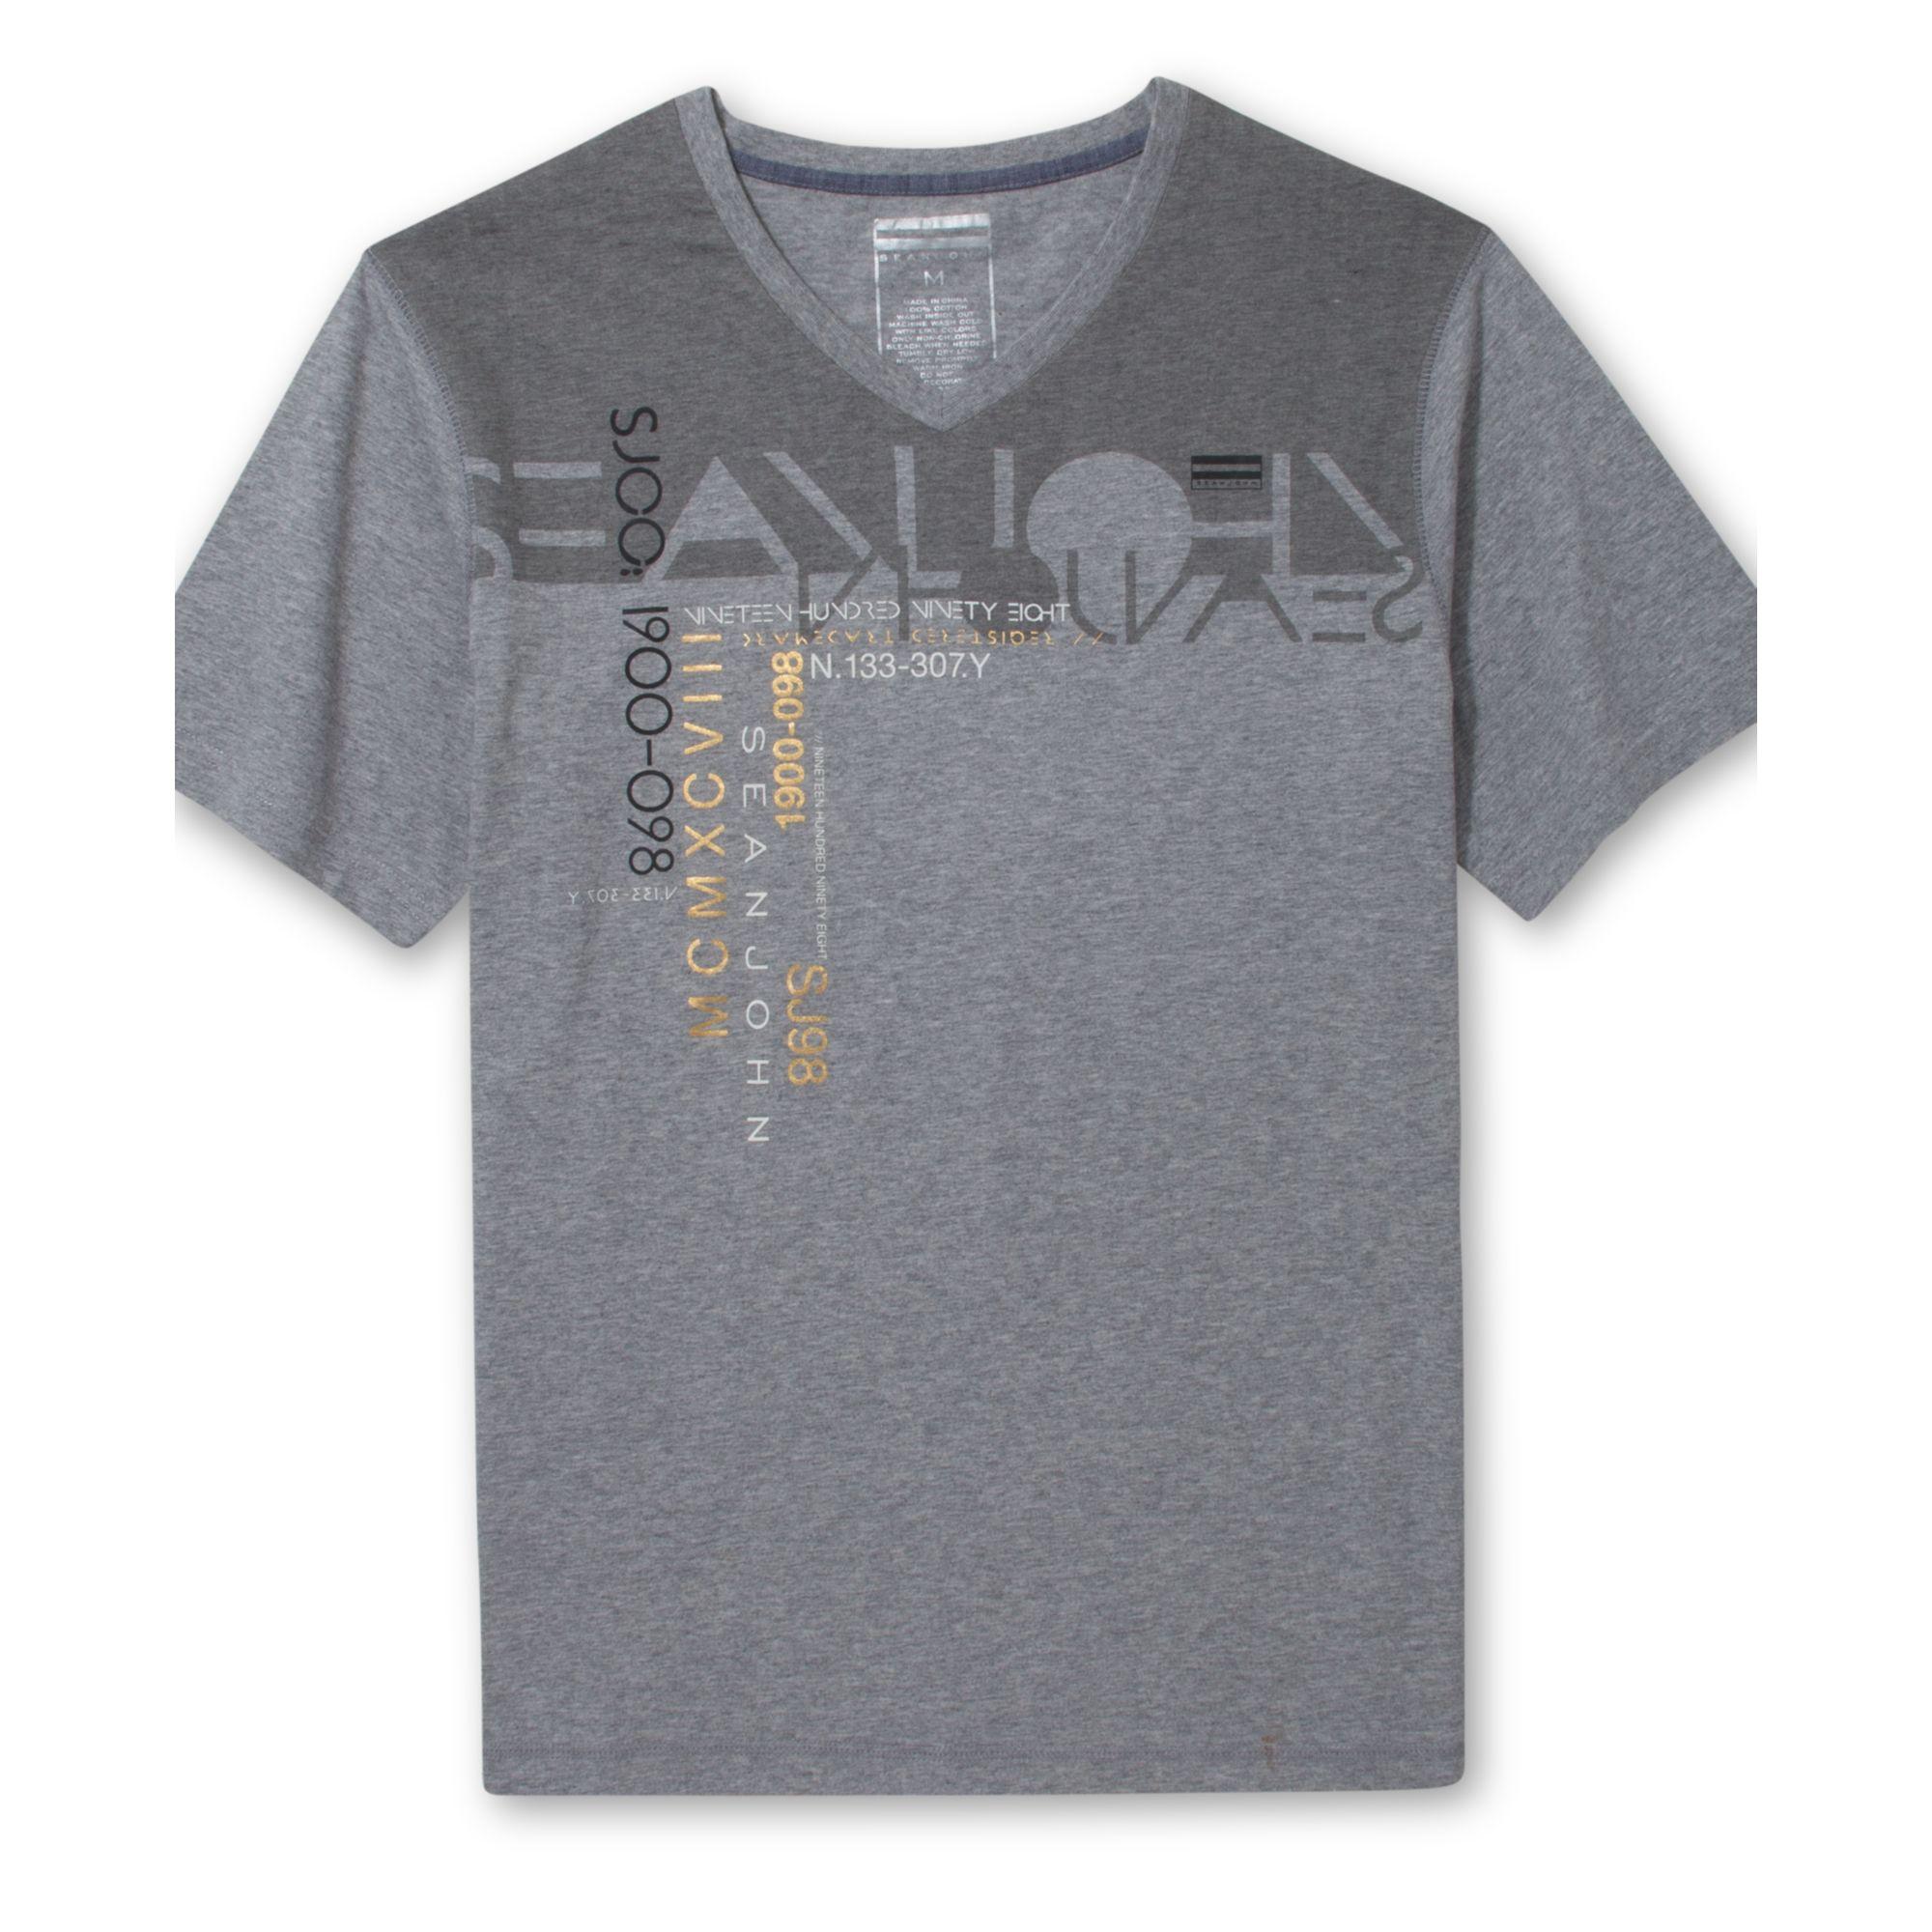 Sean john big tall new era t shirt in gray for men grey for Sean john t shirts for mens